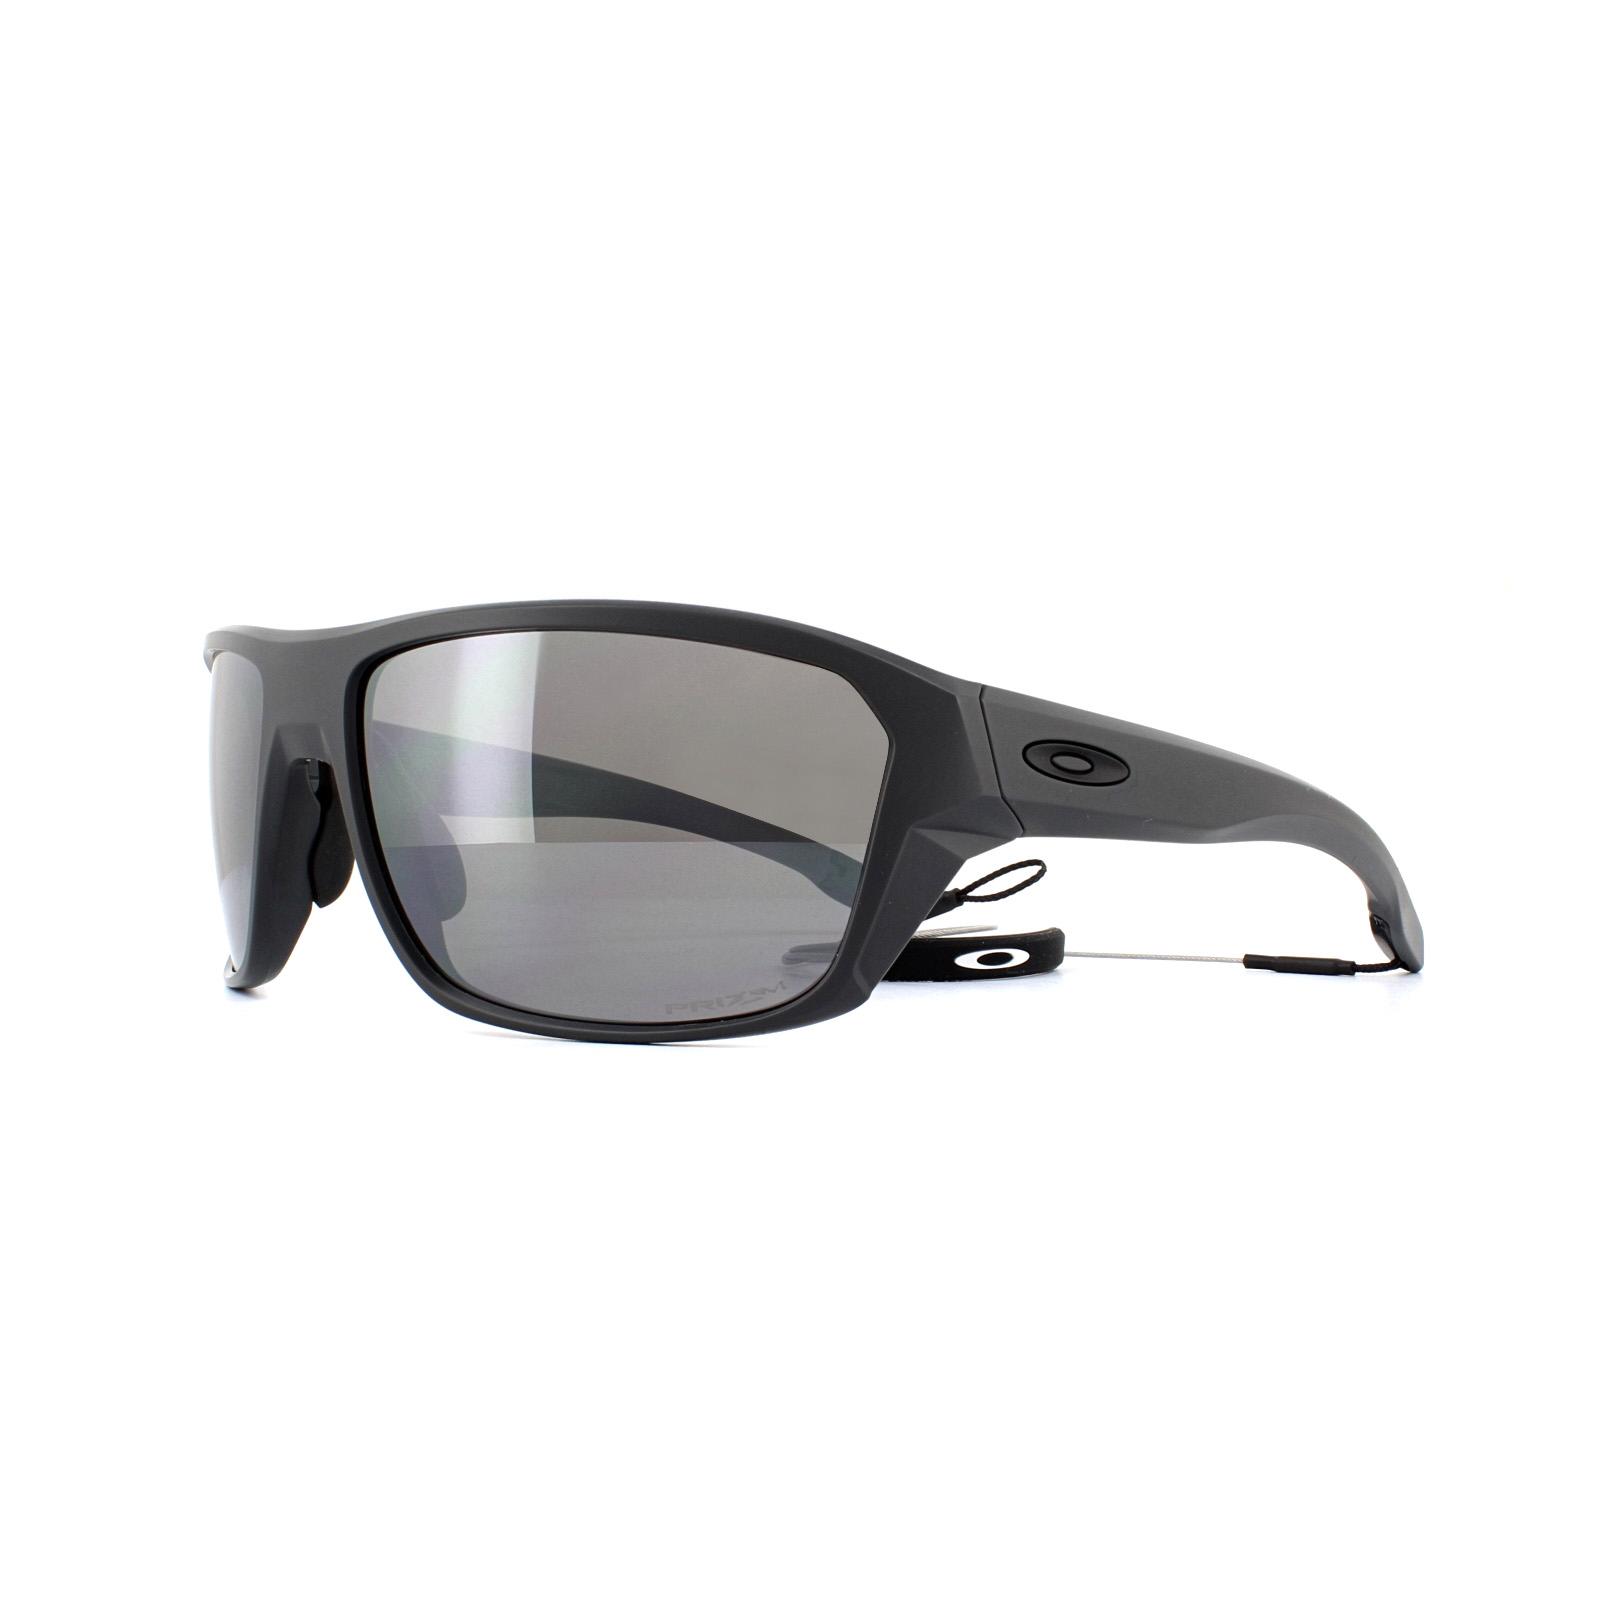 dc56966a9b Sentinel Oakley Sunglasses Split Shot OO9416-06 Matte Black Prizm Deep  Water Polarized